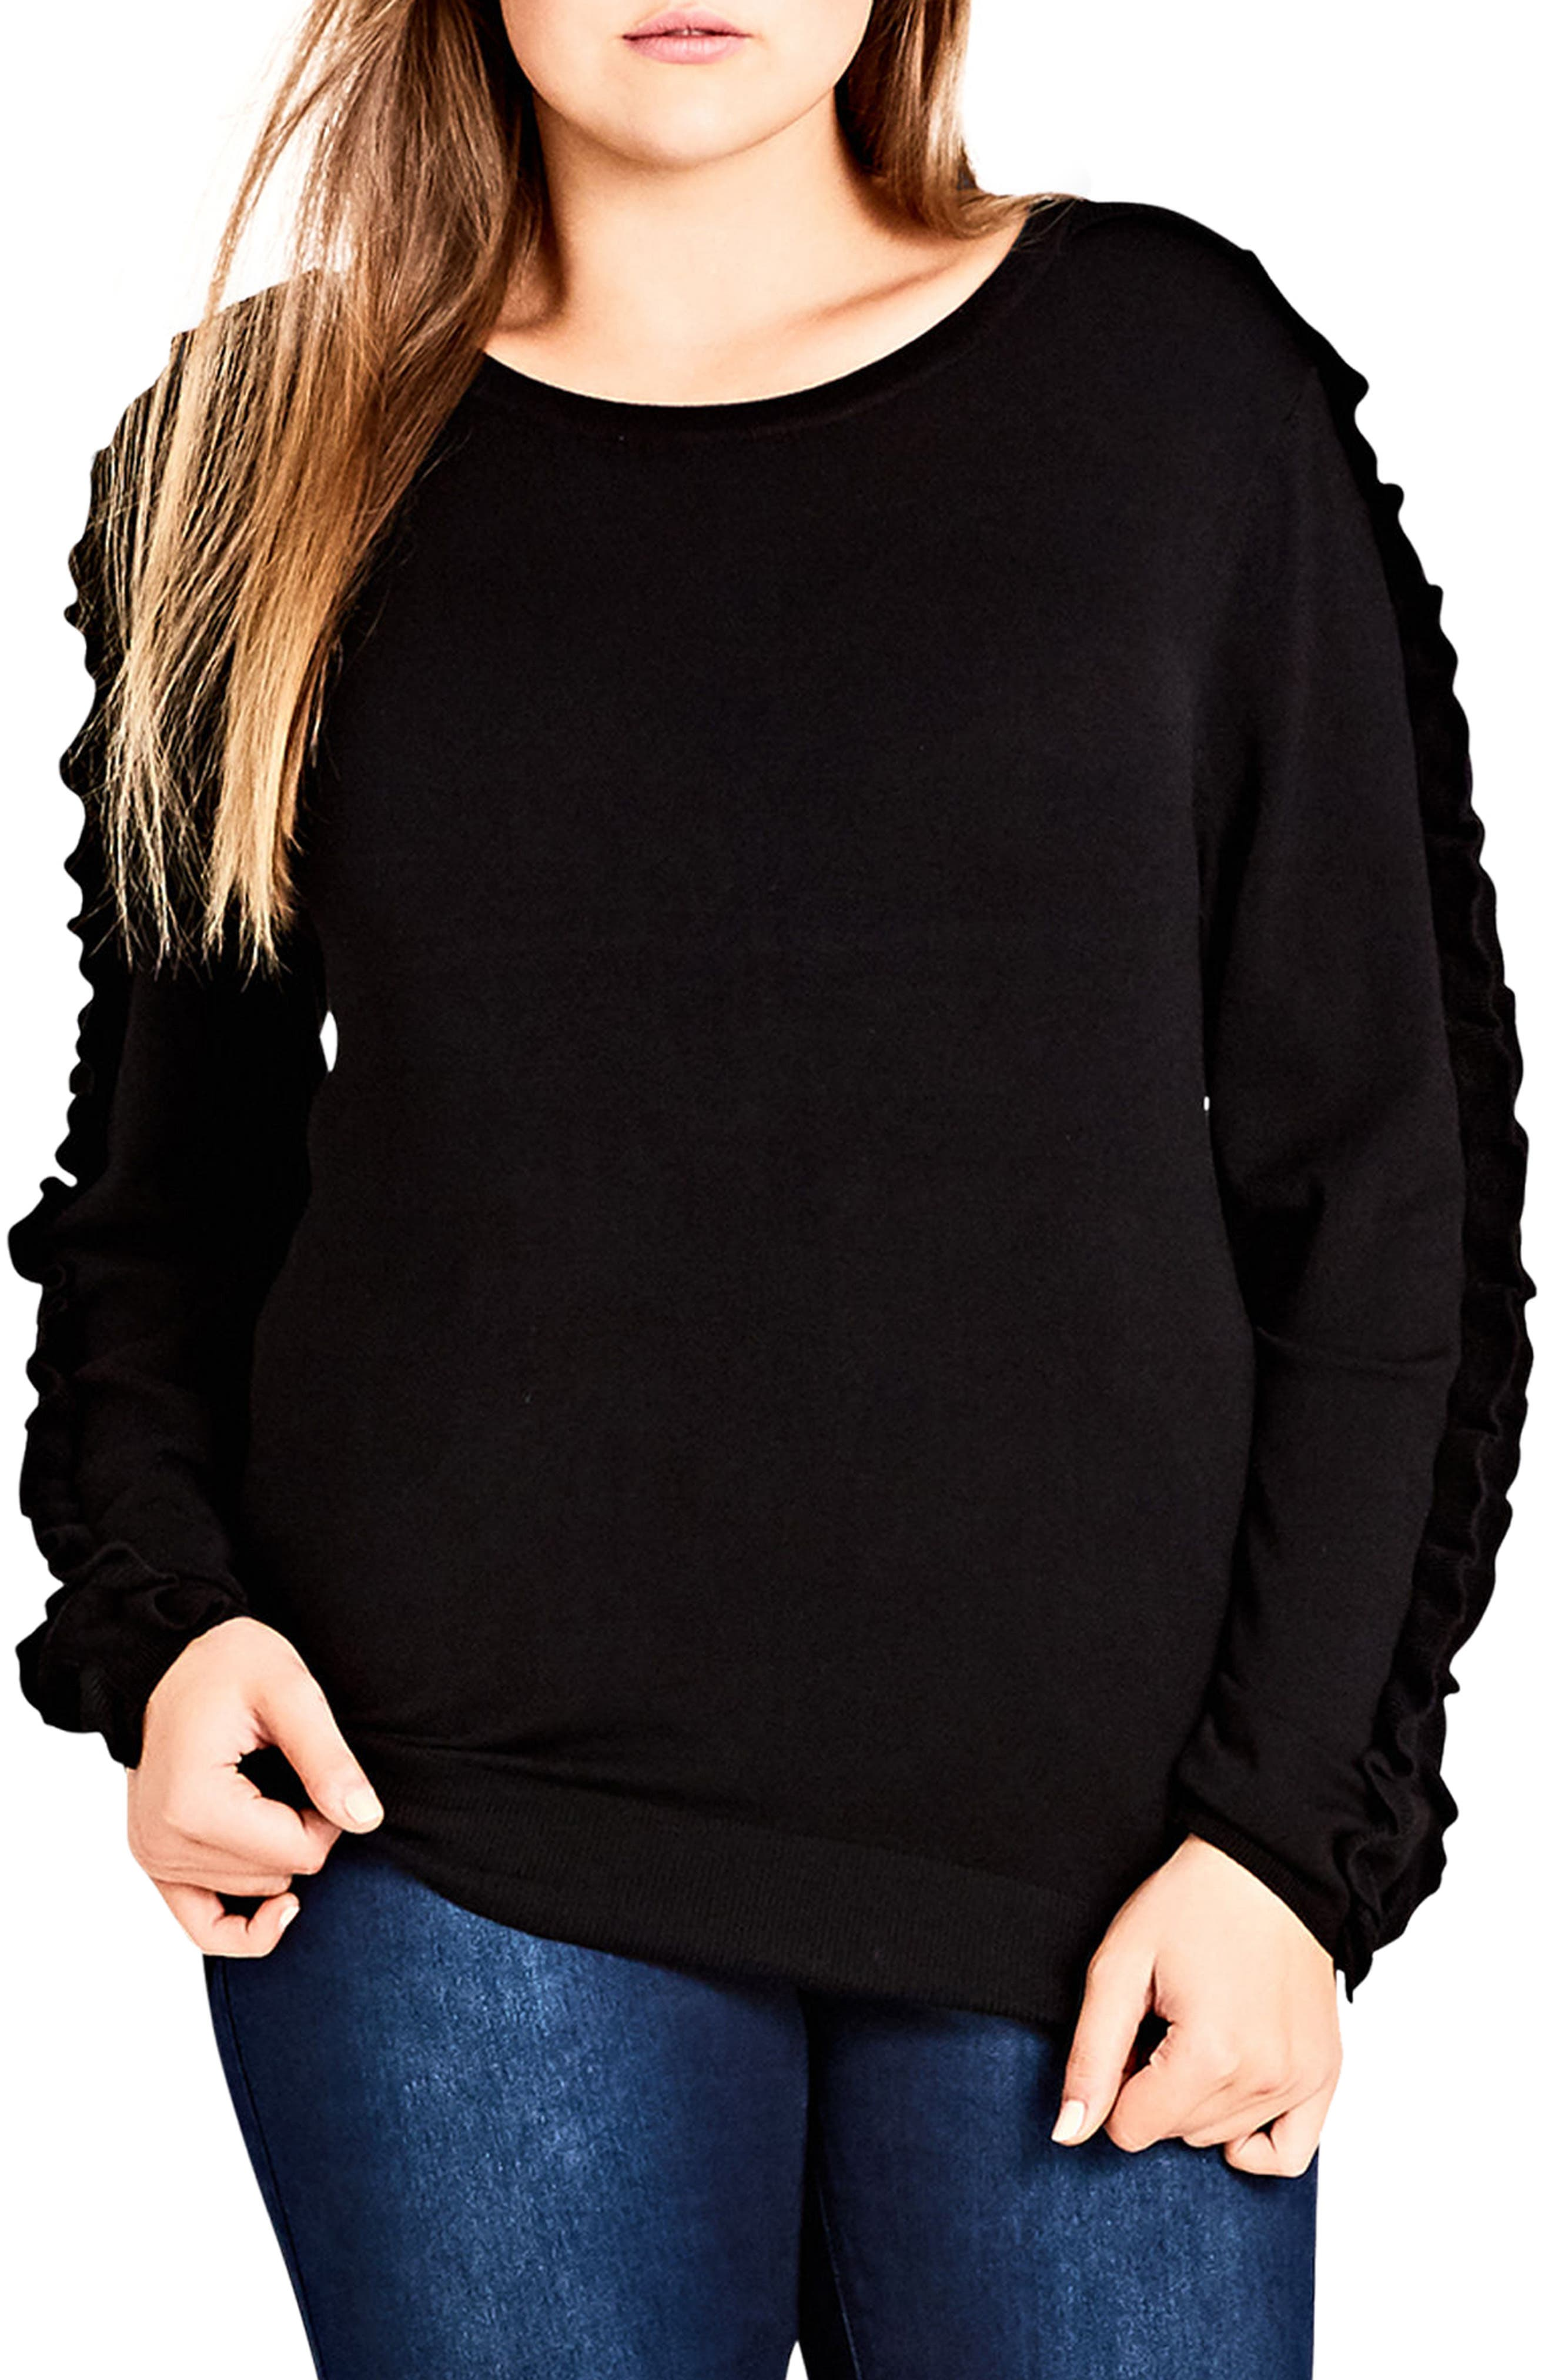 Charmed Ruffle Sleeve Sweater,                             Main thumbnail 1, color,                             001